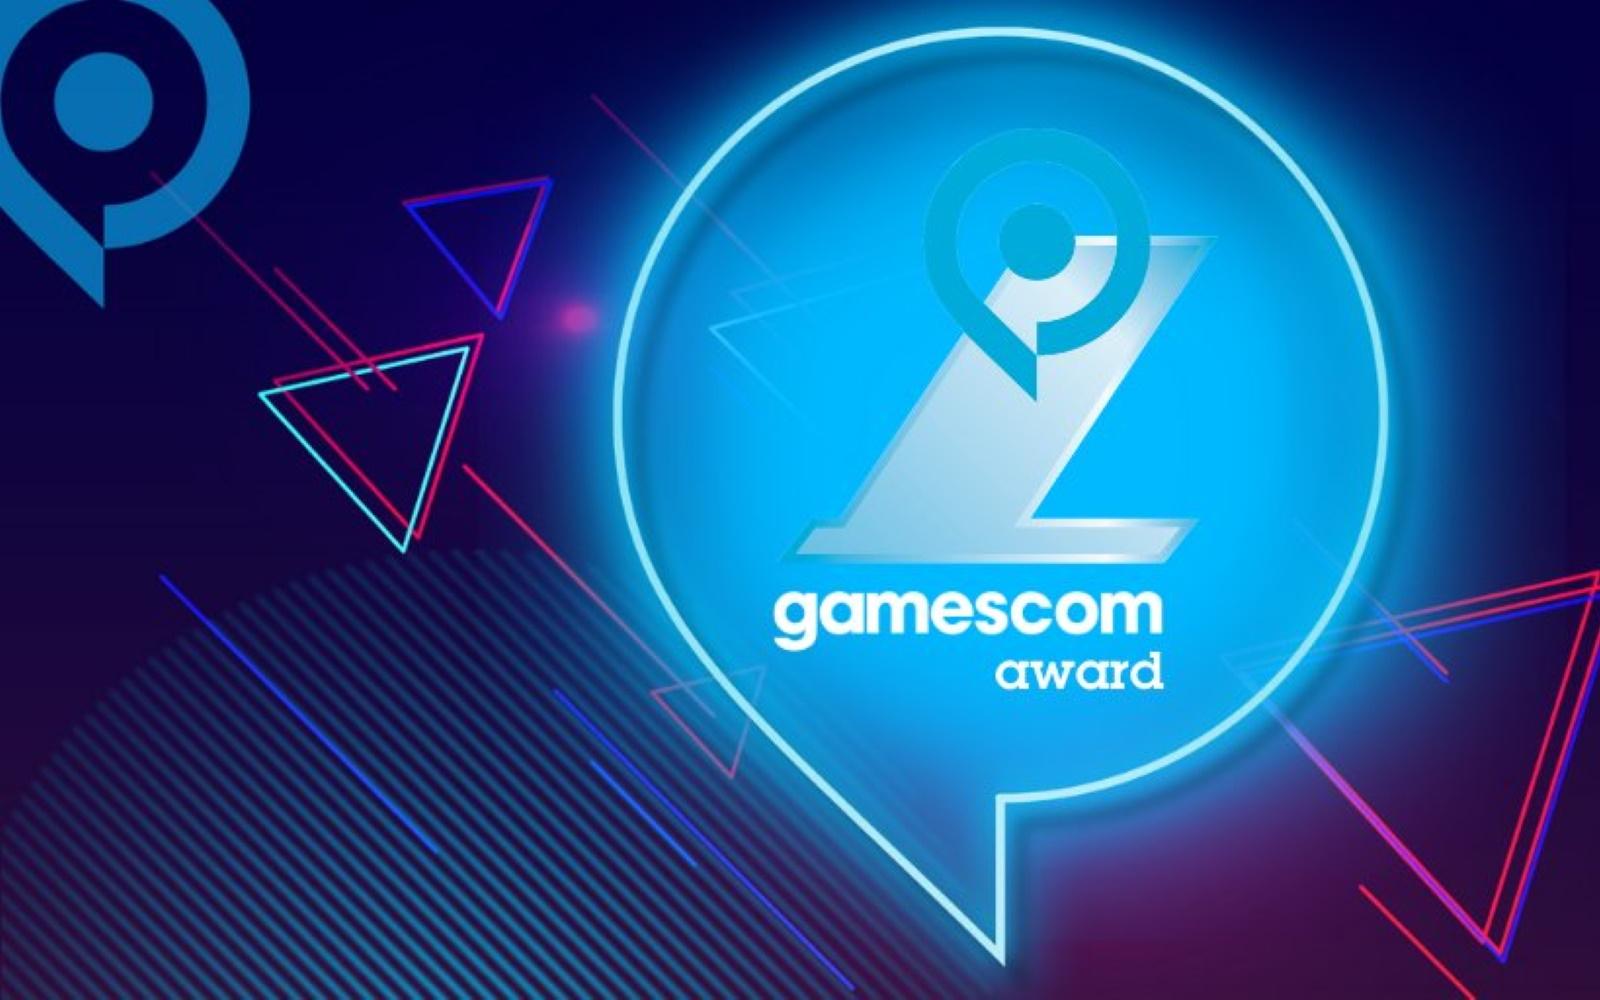 Gamescom Award Winners Announced